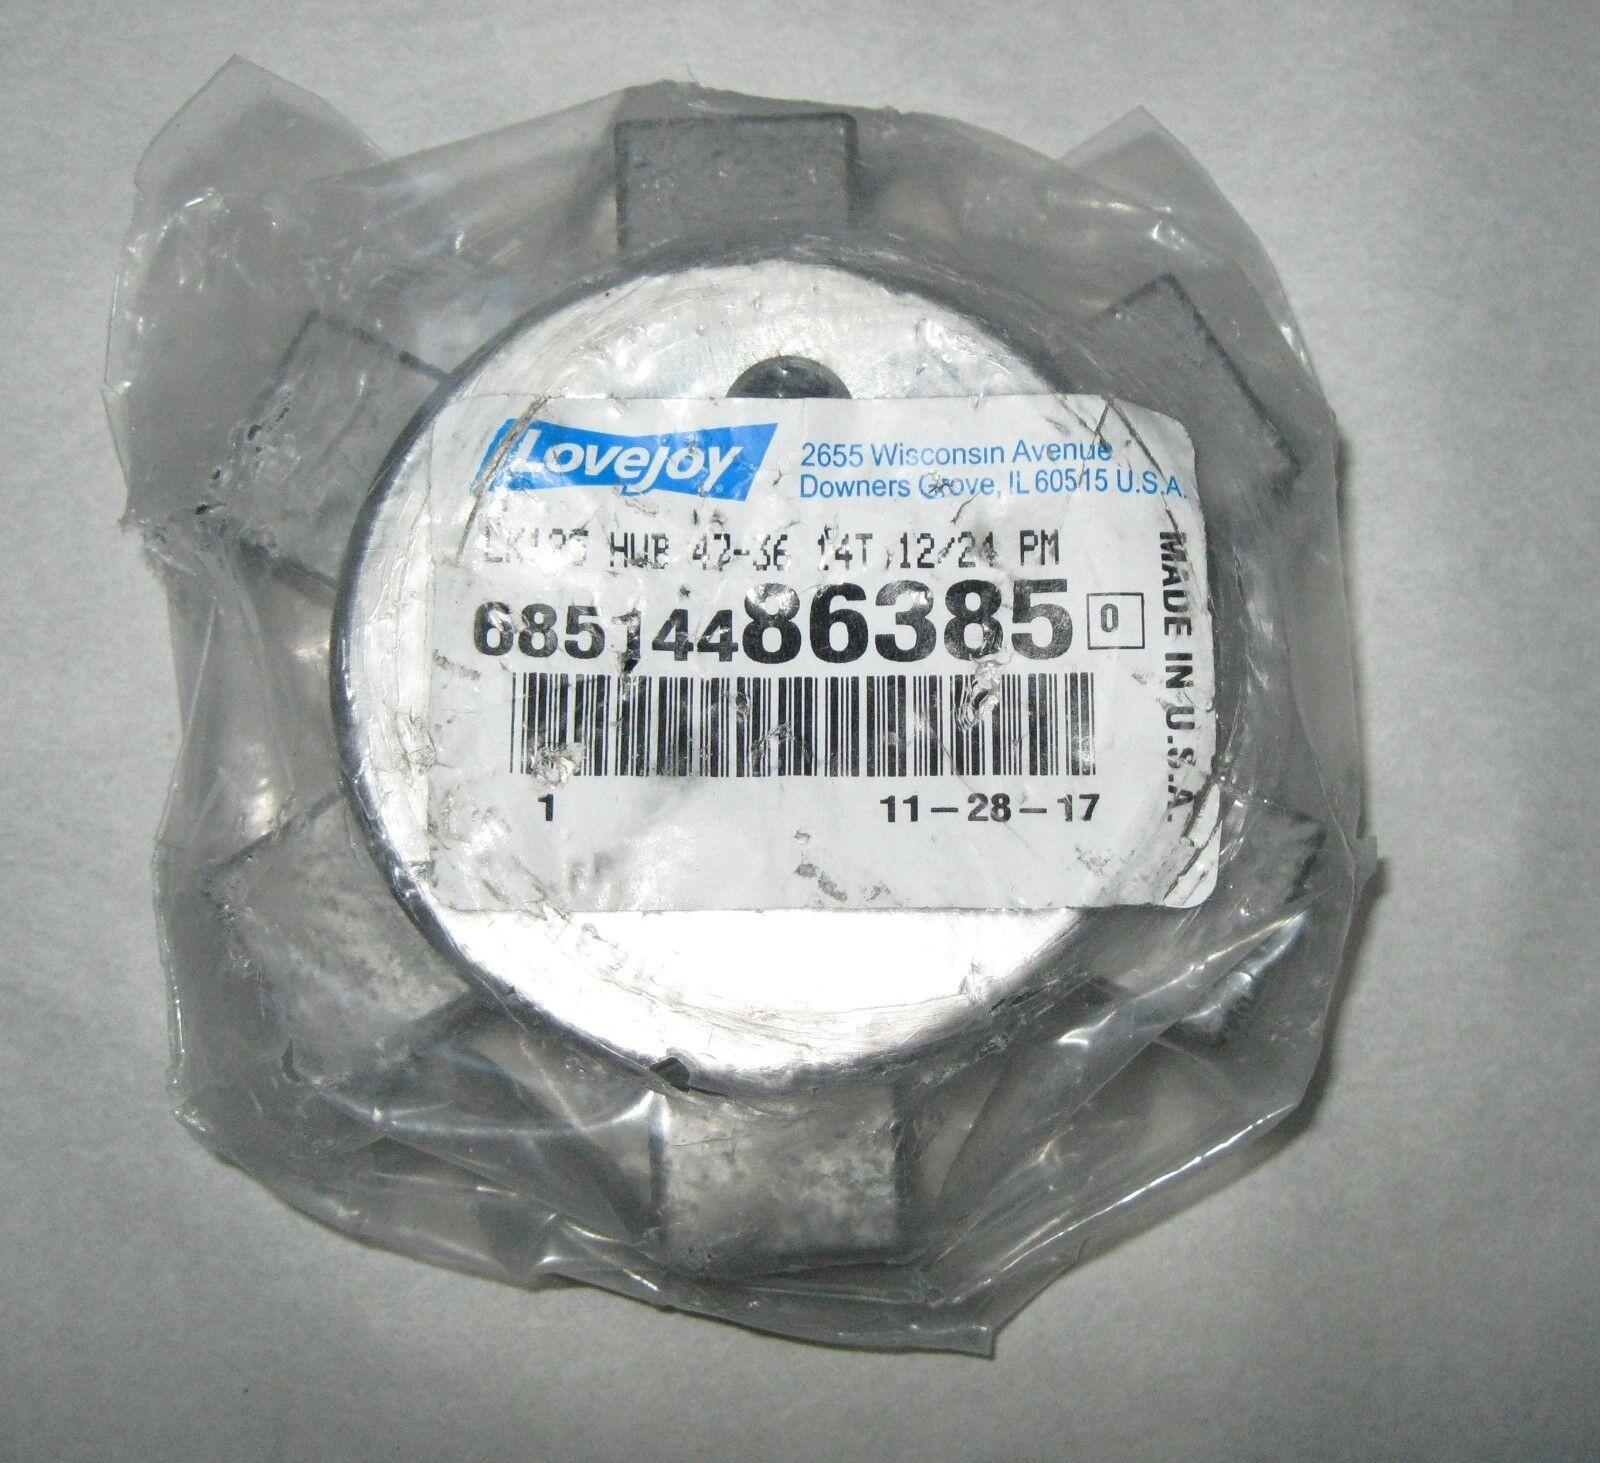 95.2 mm OD 35.0 mm Bore 3.3 mm x 10 mm Keyway 95.2 mm Overall Length Lovejoy 69790435073 Steel Hercuflex FXL Series M 2 Gear Hub 62.0 mm Length Through Bore 4406 Nm Maximum Torque